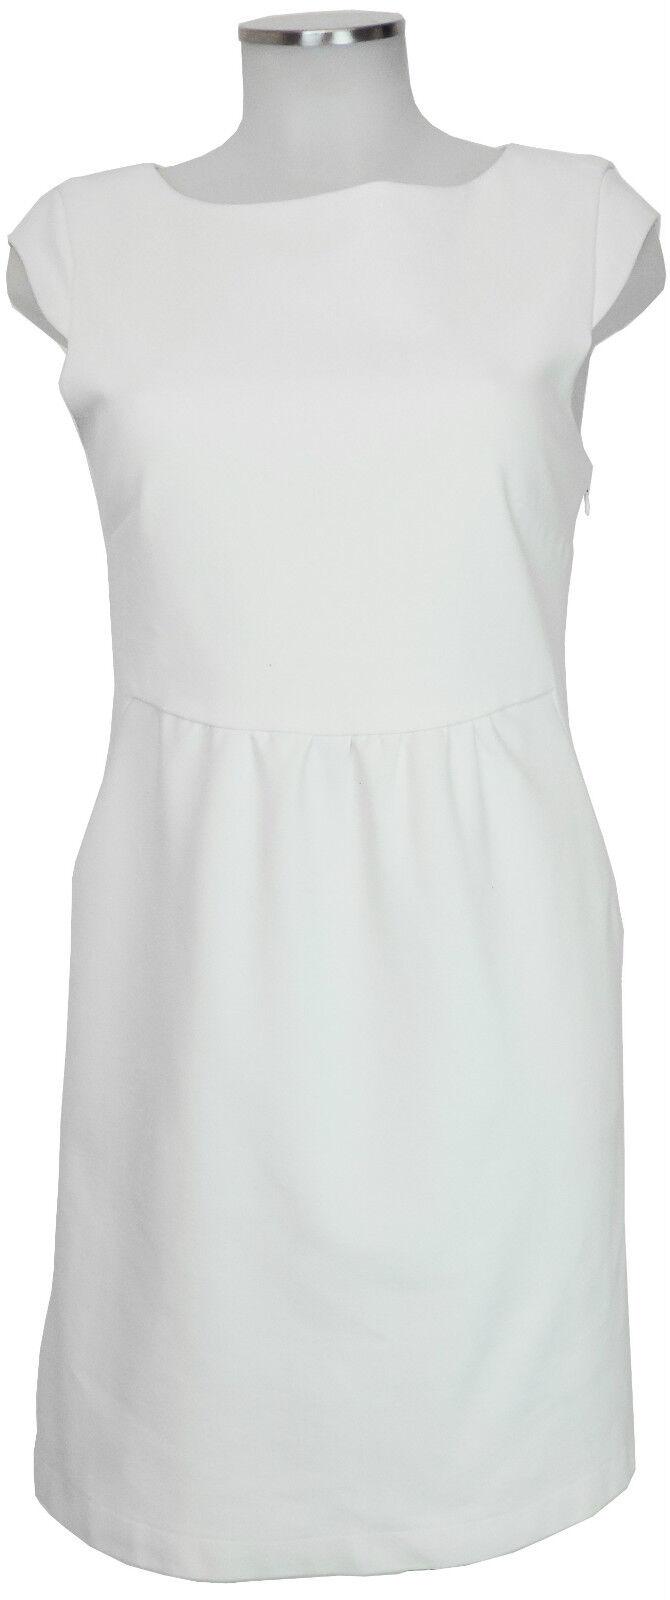 Joana Danciu Kleid Etuikleid 36 38 weiss Viskose femininer Luxus dress top